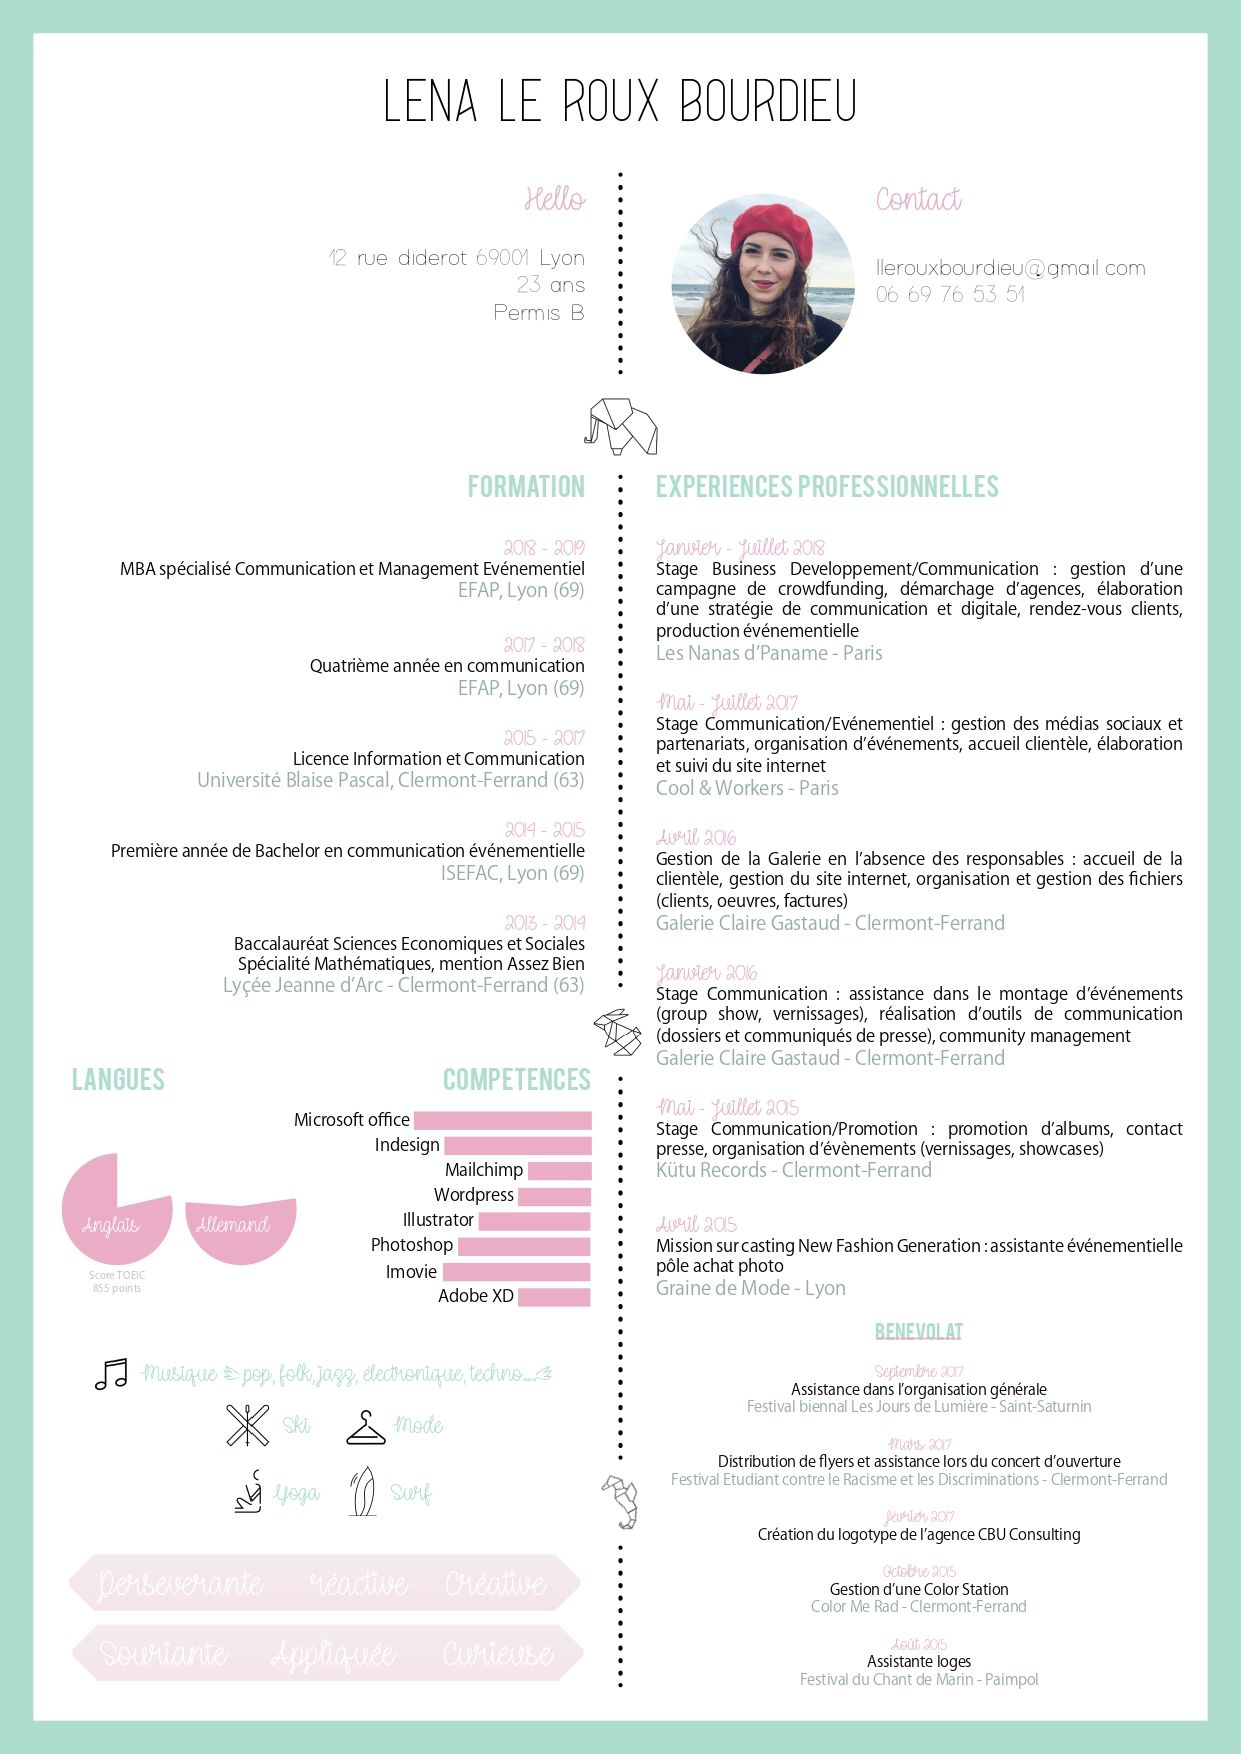 Cv Origami Strategie De Communication Cv Creatif Permis B